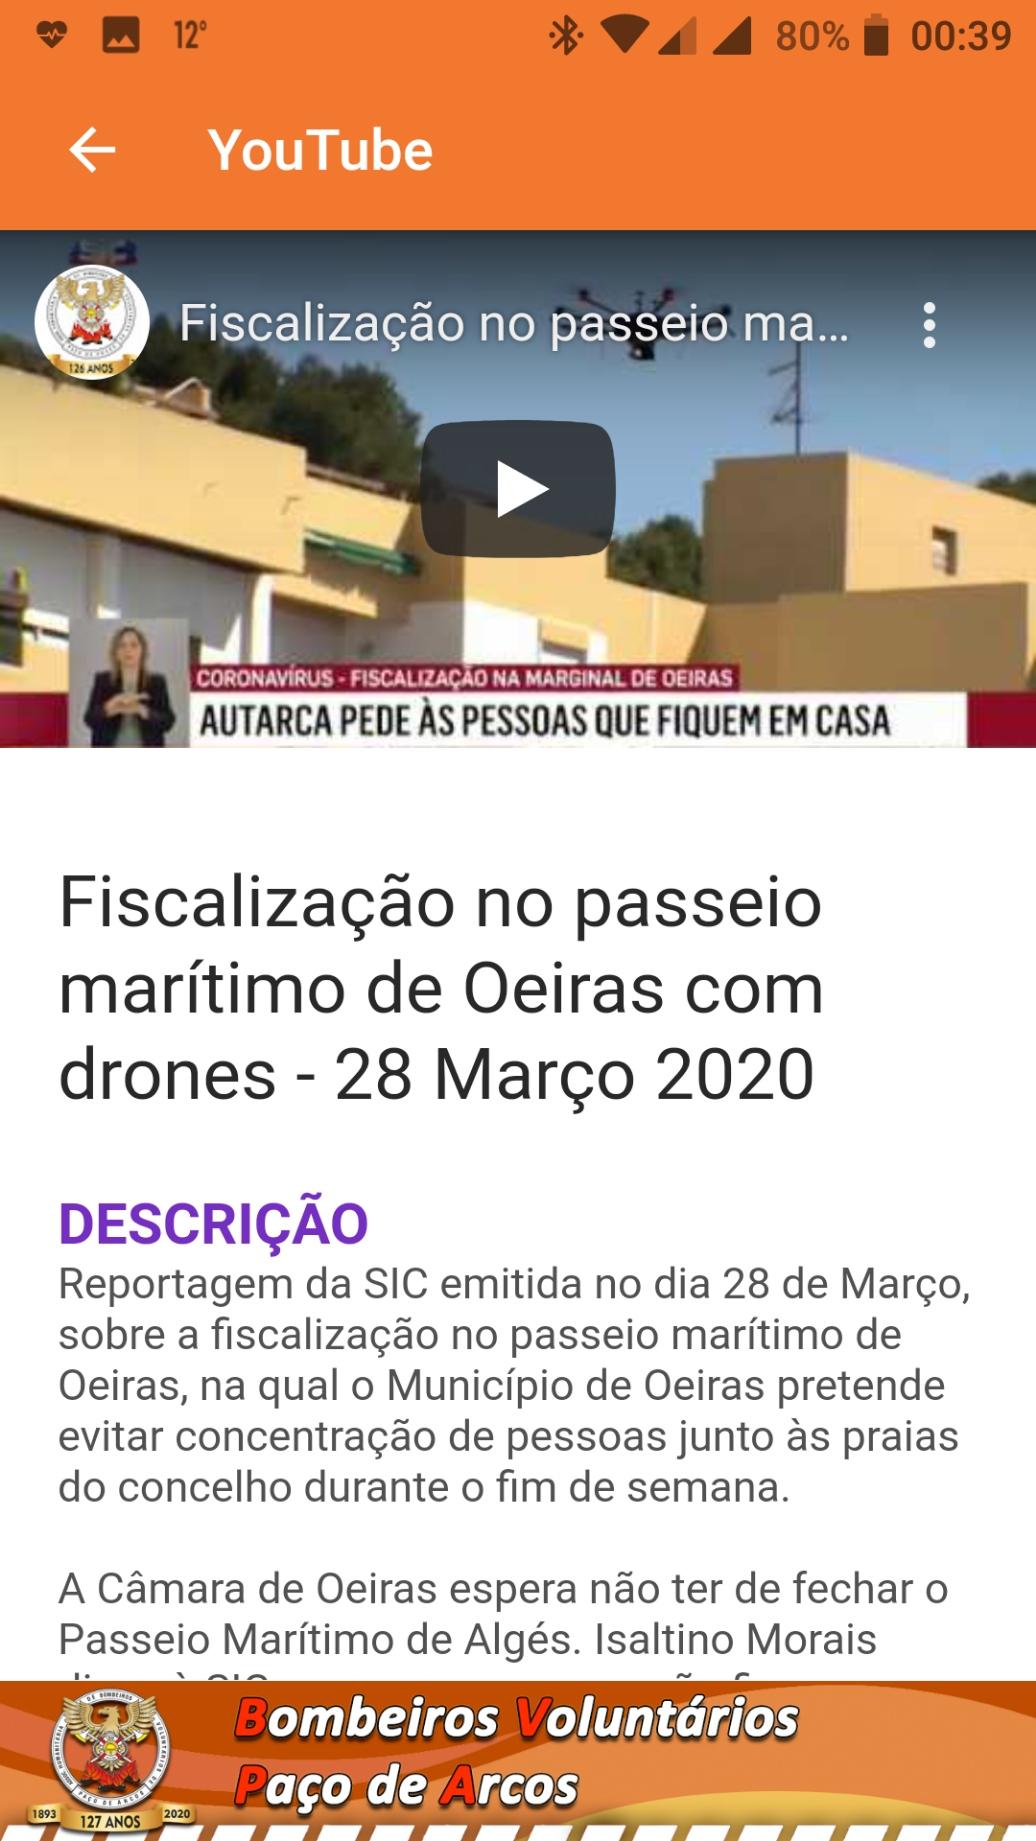 app_bvpacodearcos_20201030 (19)